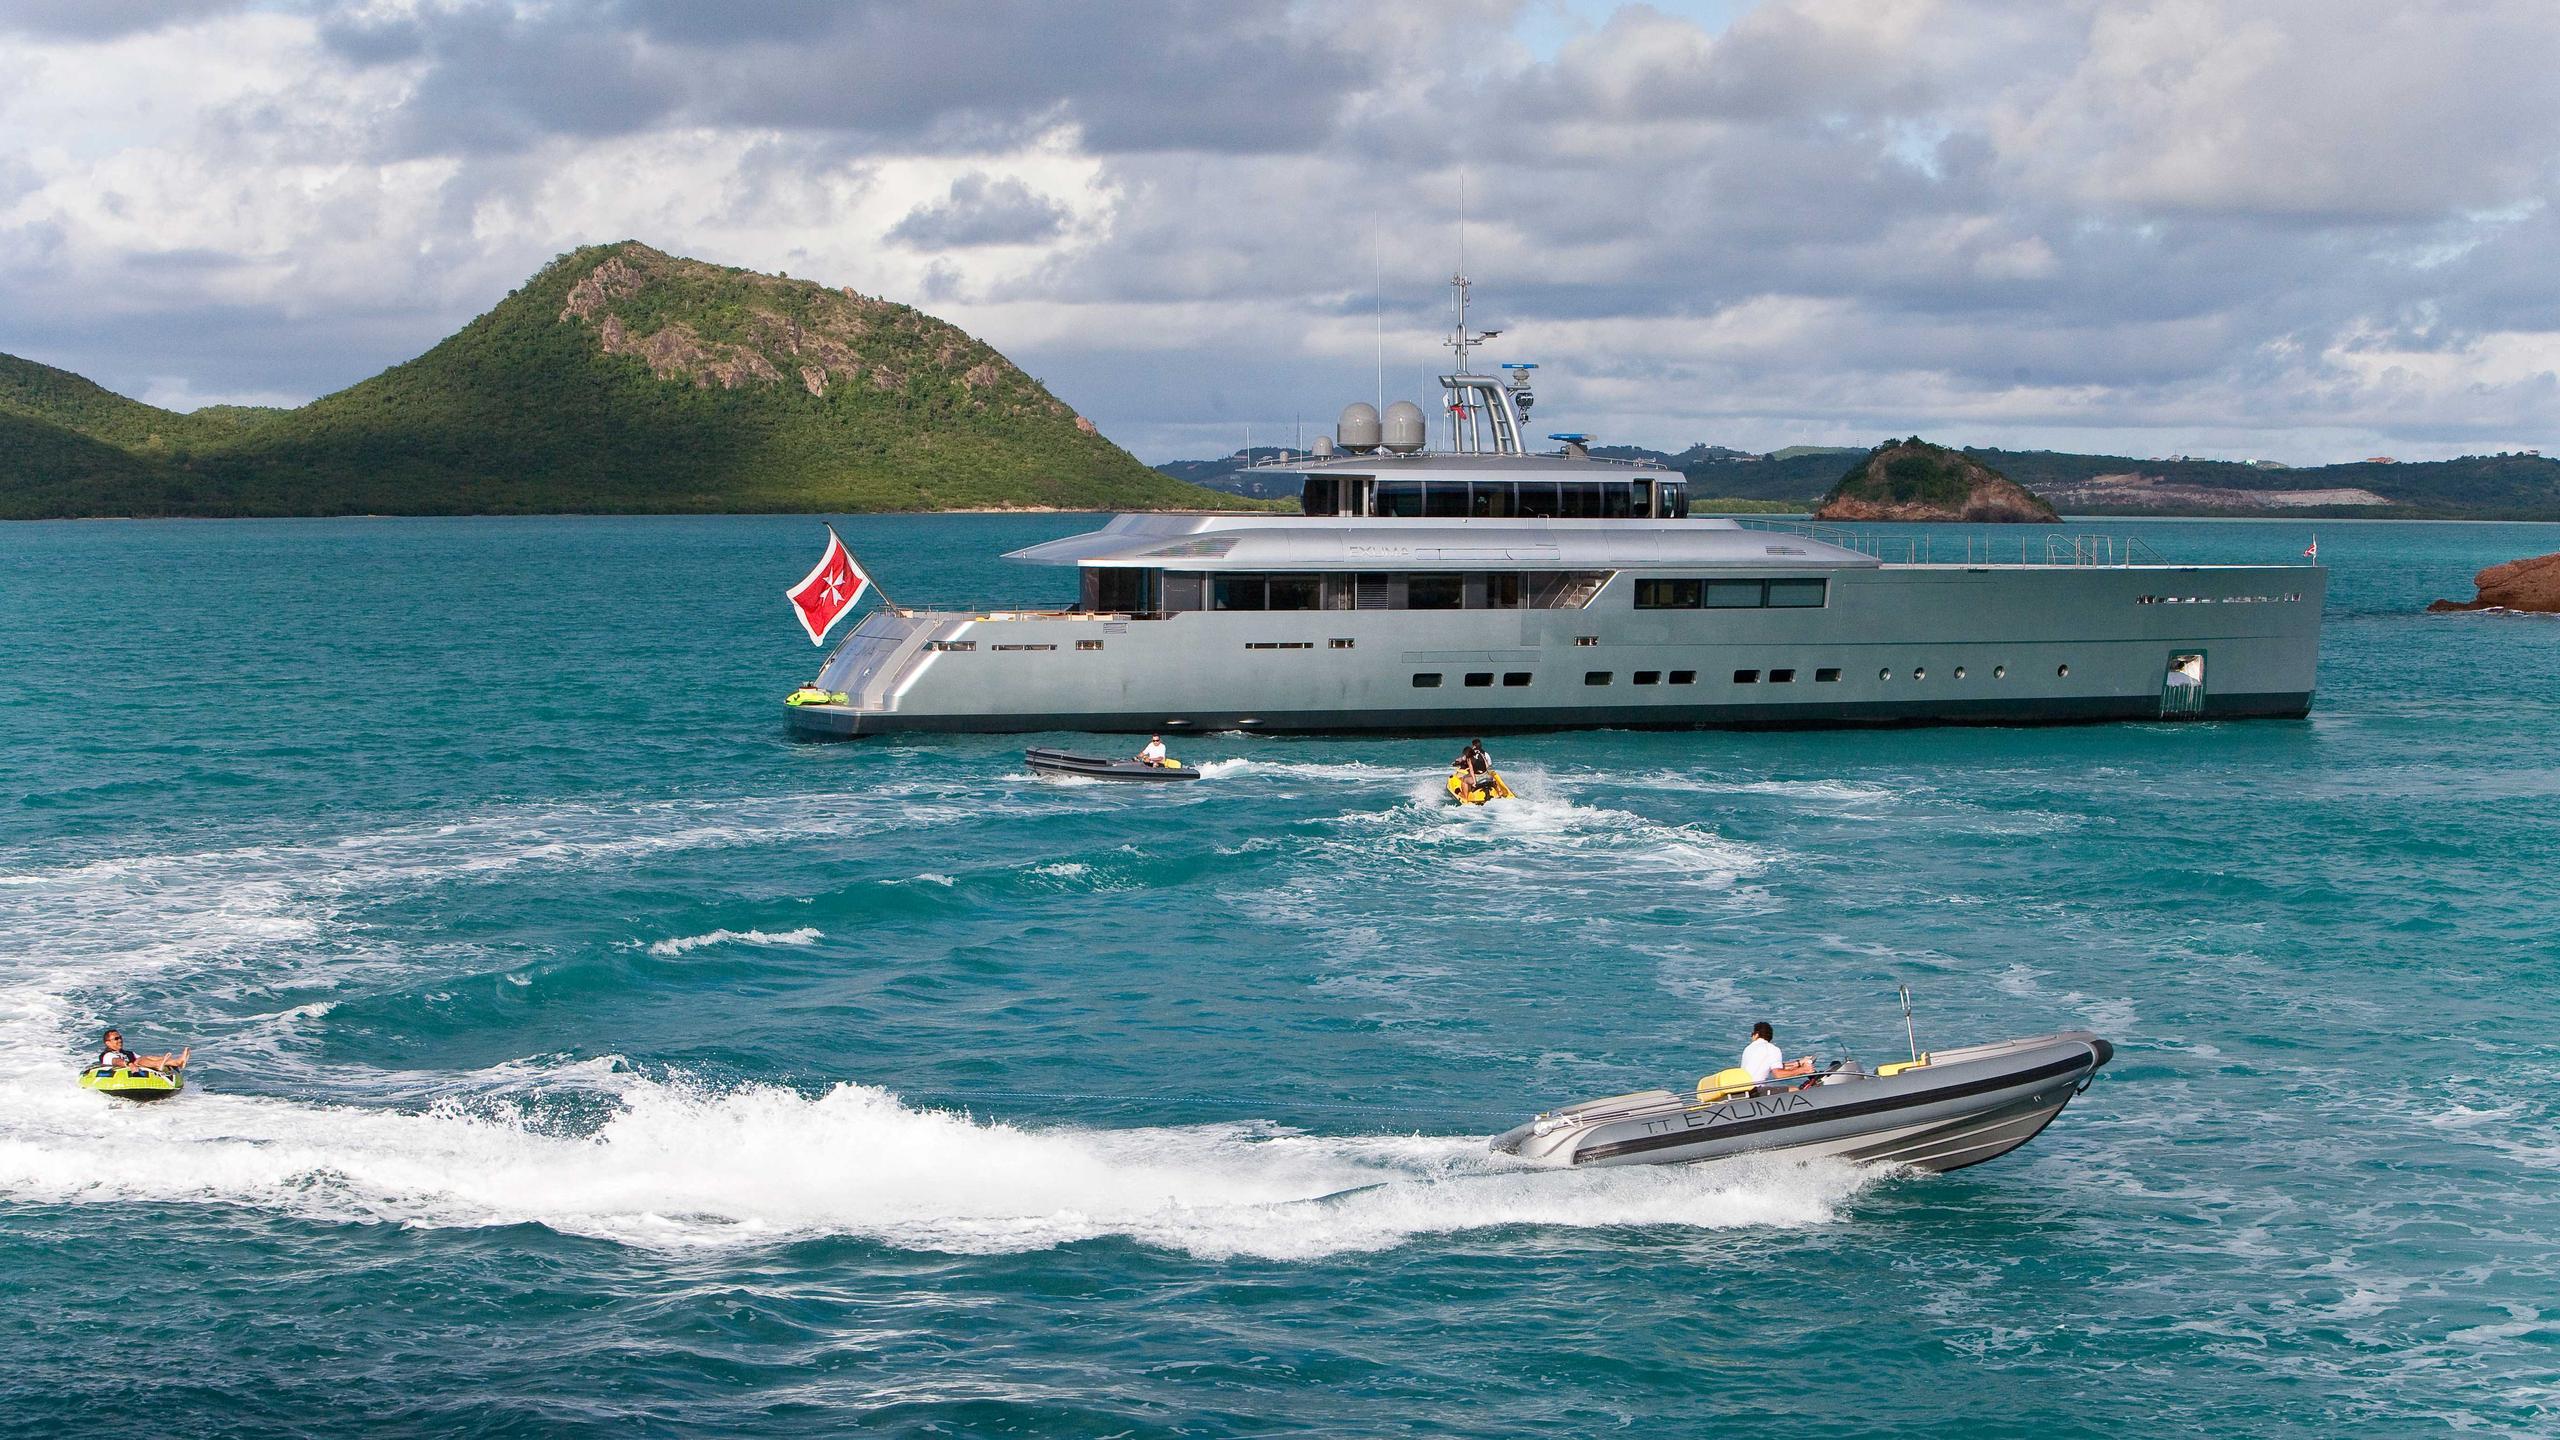 exuma-motor-yacht-perini-navi-picchiotti-2010-50m-profile-tender